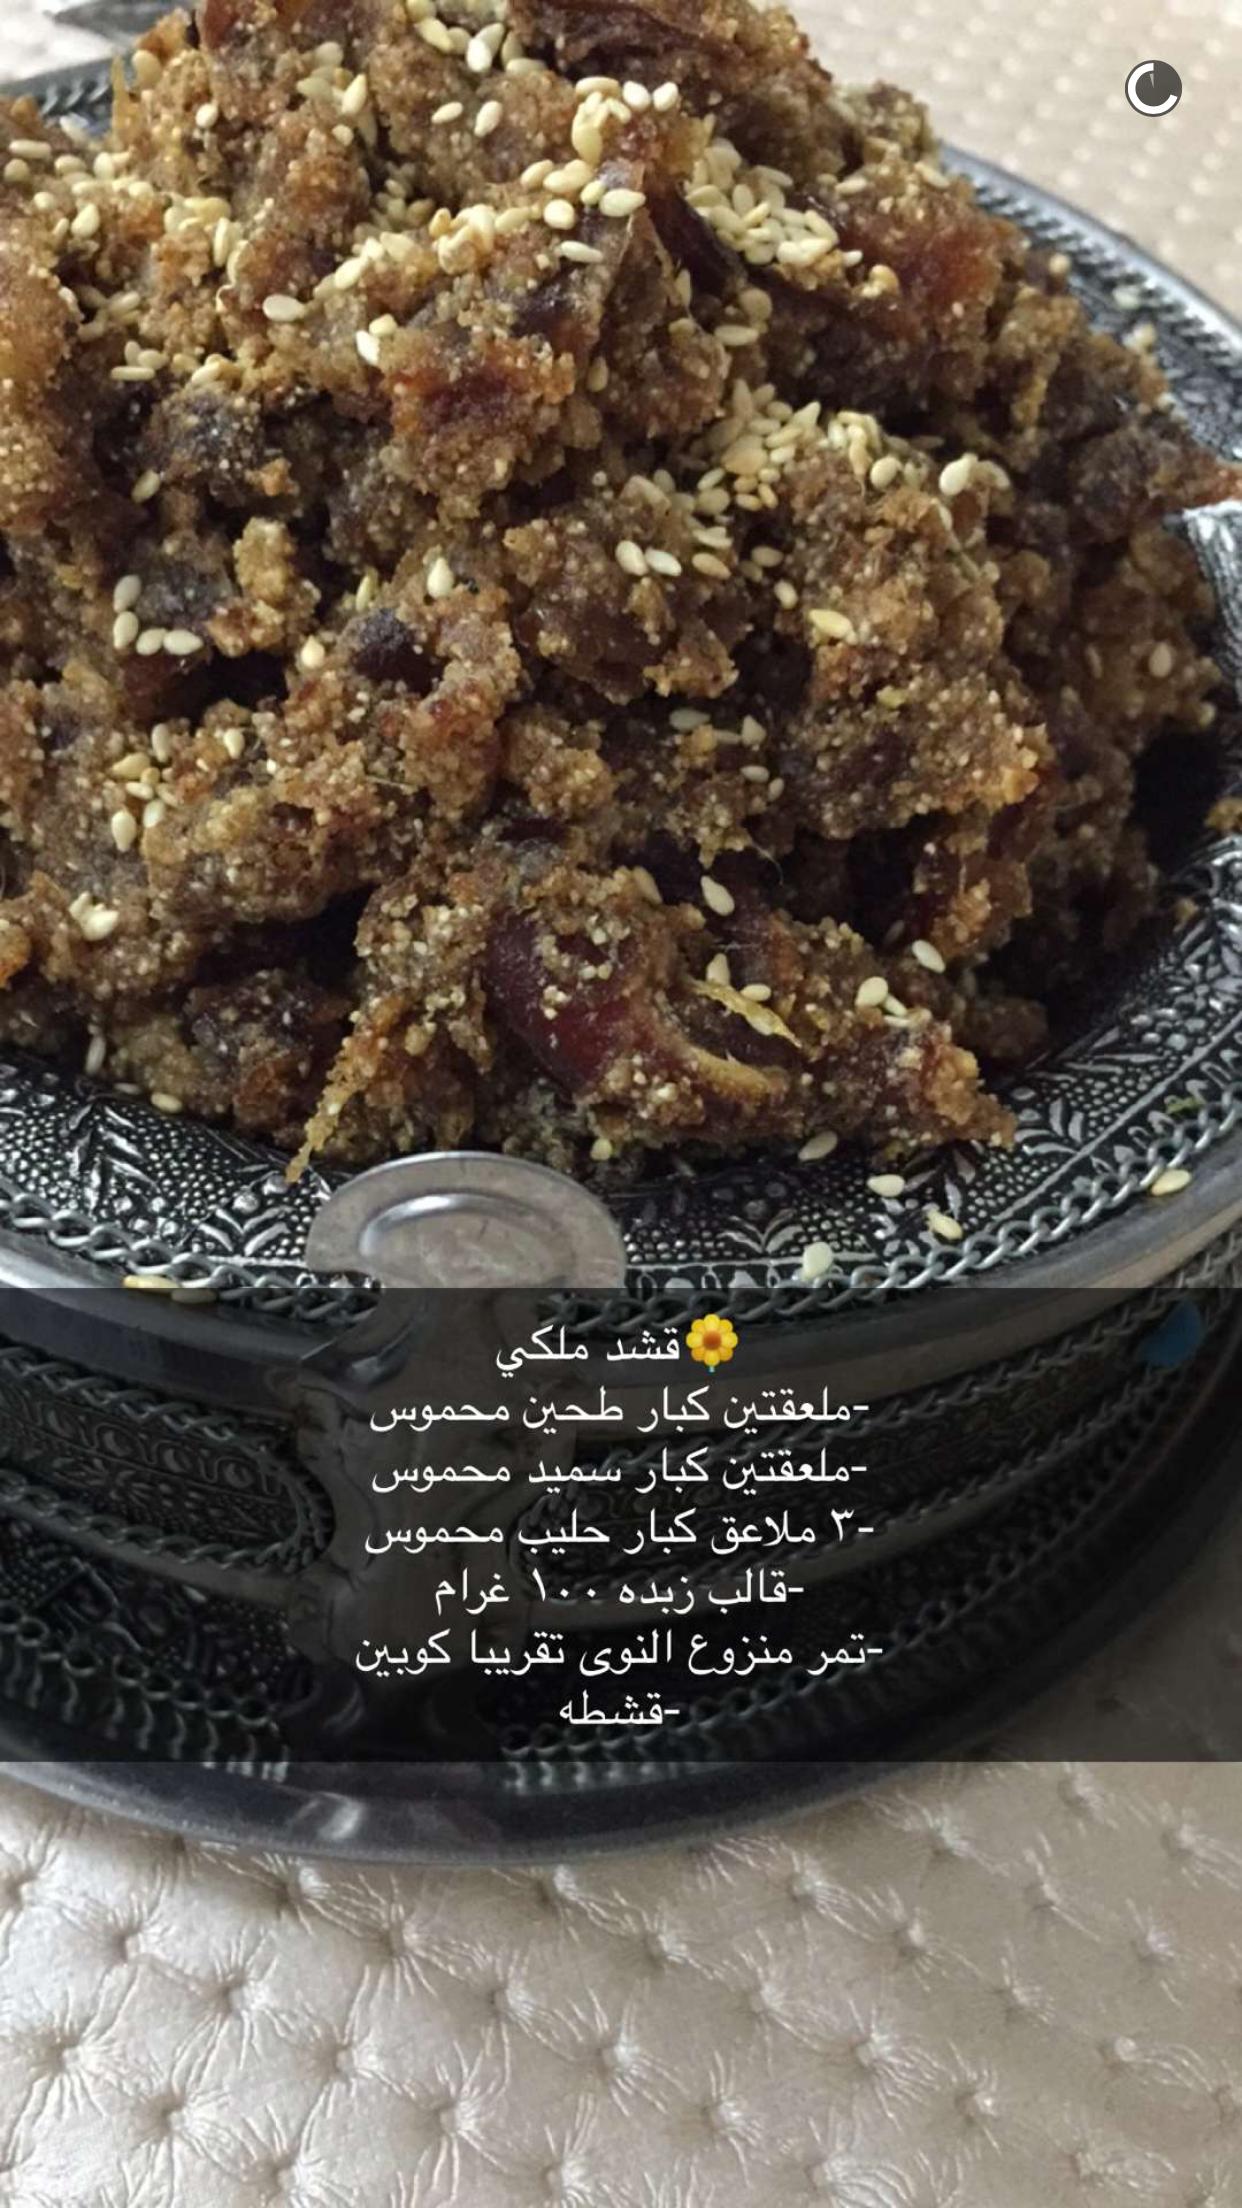 Pin By Muna Dubai On طبخ Save Food Food Receipes Diy Food Recipes